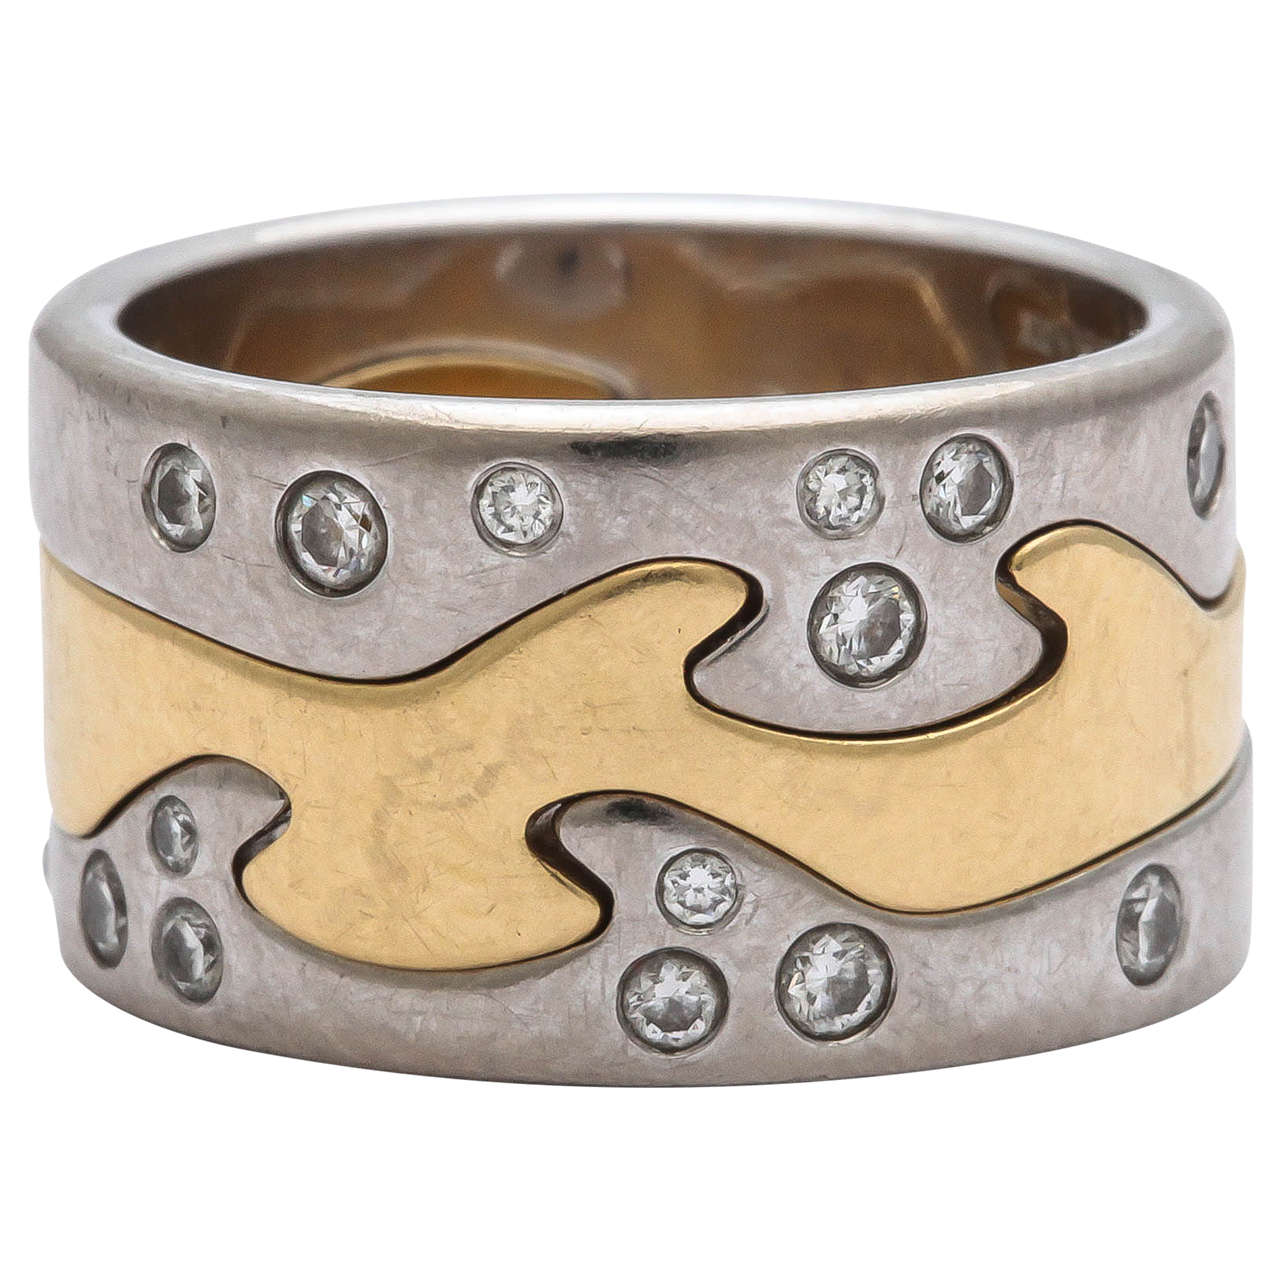 Georg Jensen by Nina Koppel Diamond Gold Fusion Ring